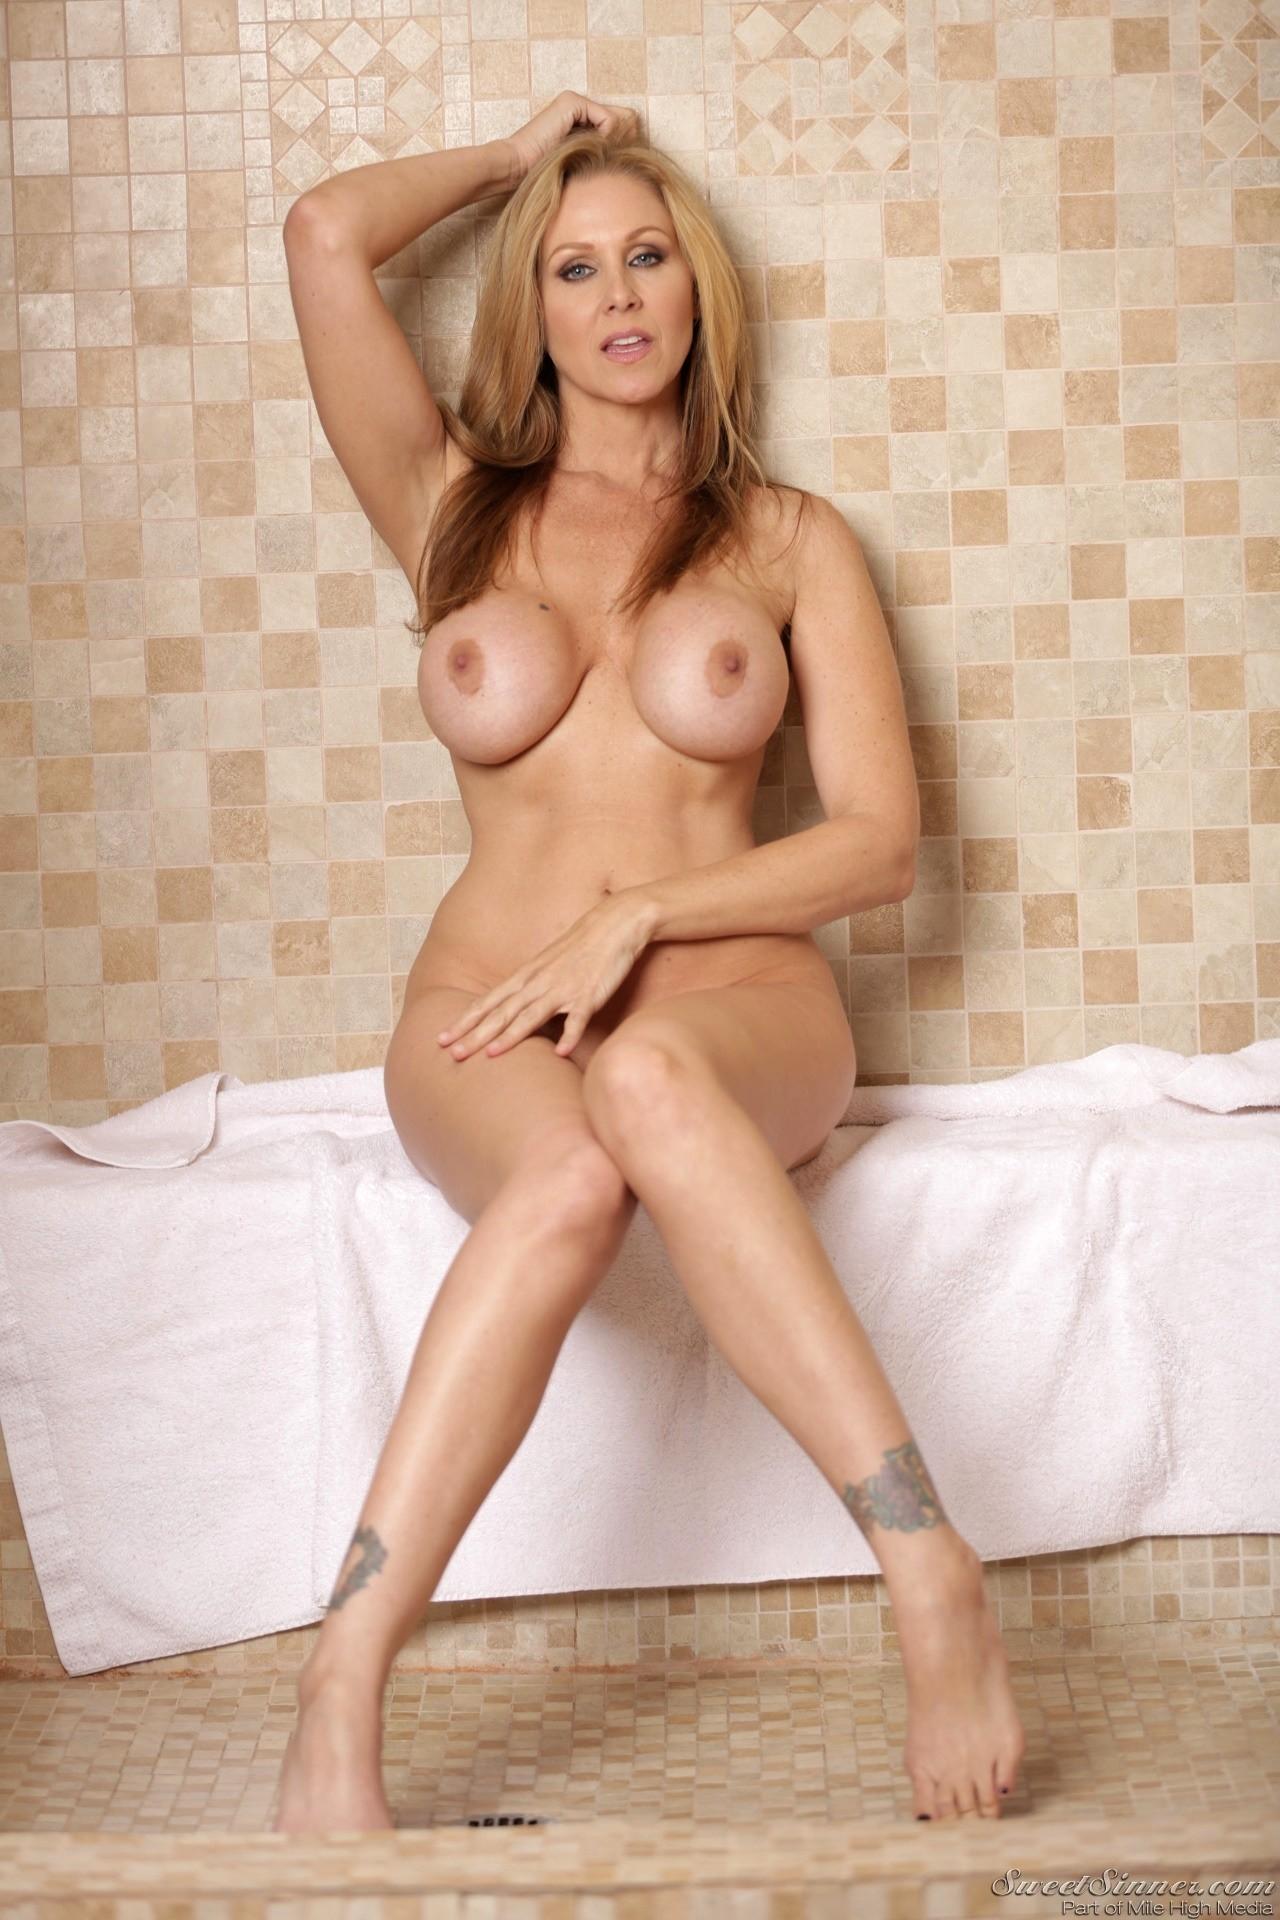 Sweet anne porn